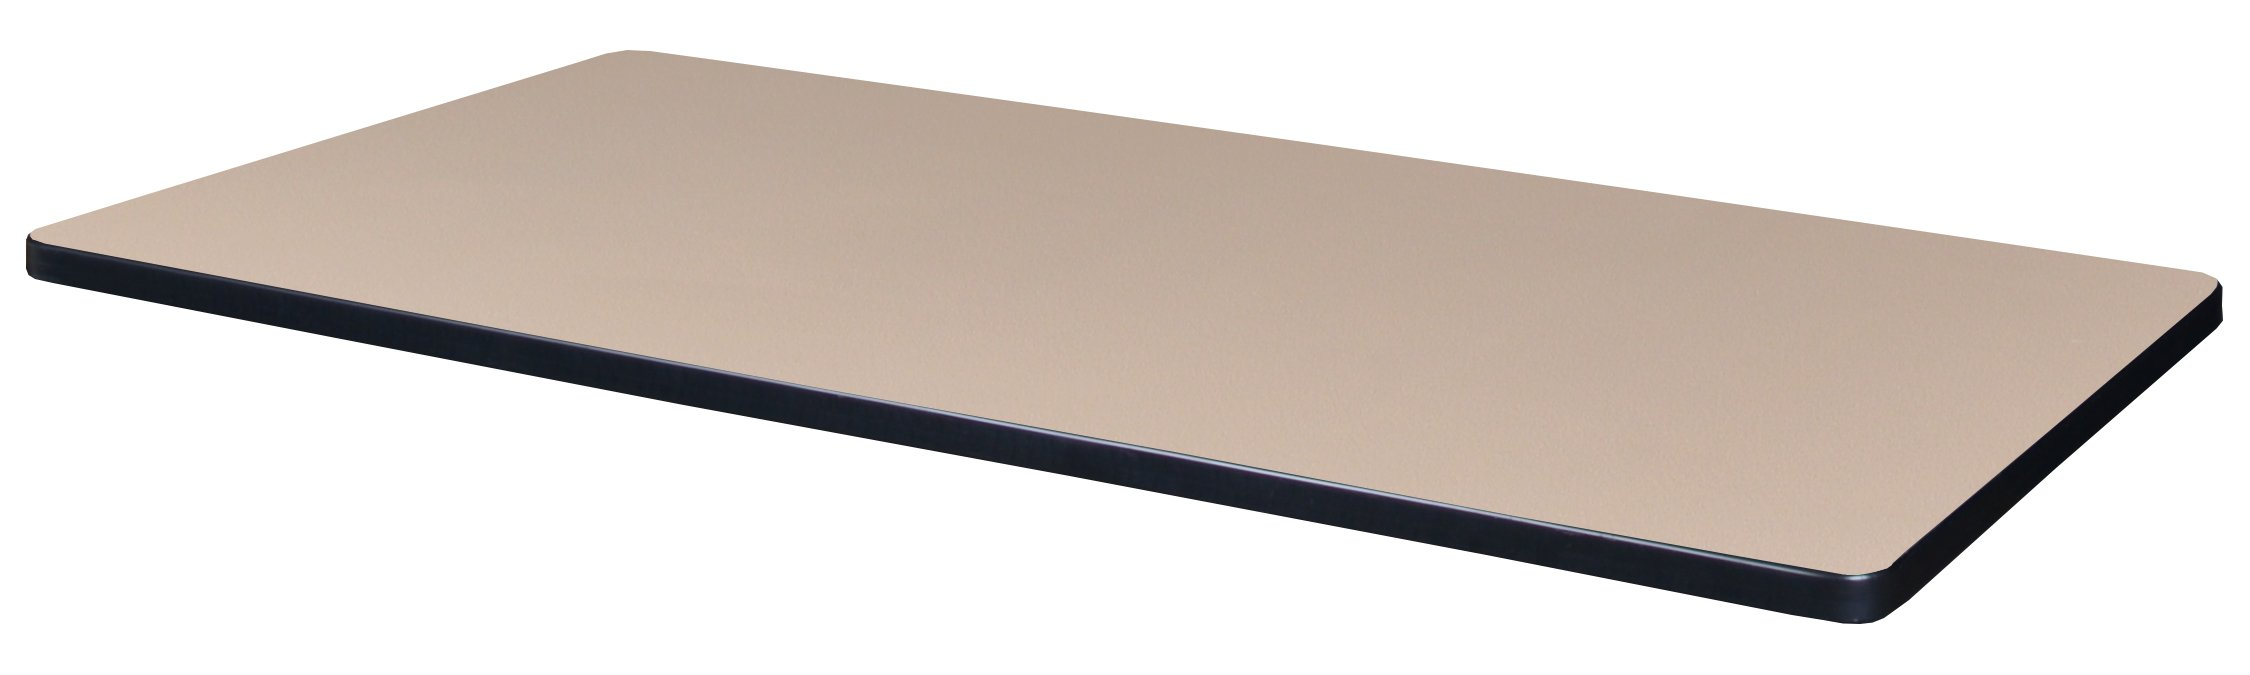 Regency Beige/Grey 48'' x 24'' Rectangle Laminate Table Top